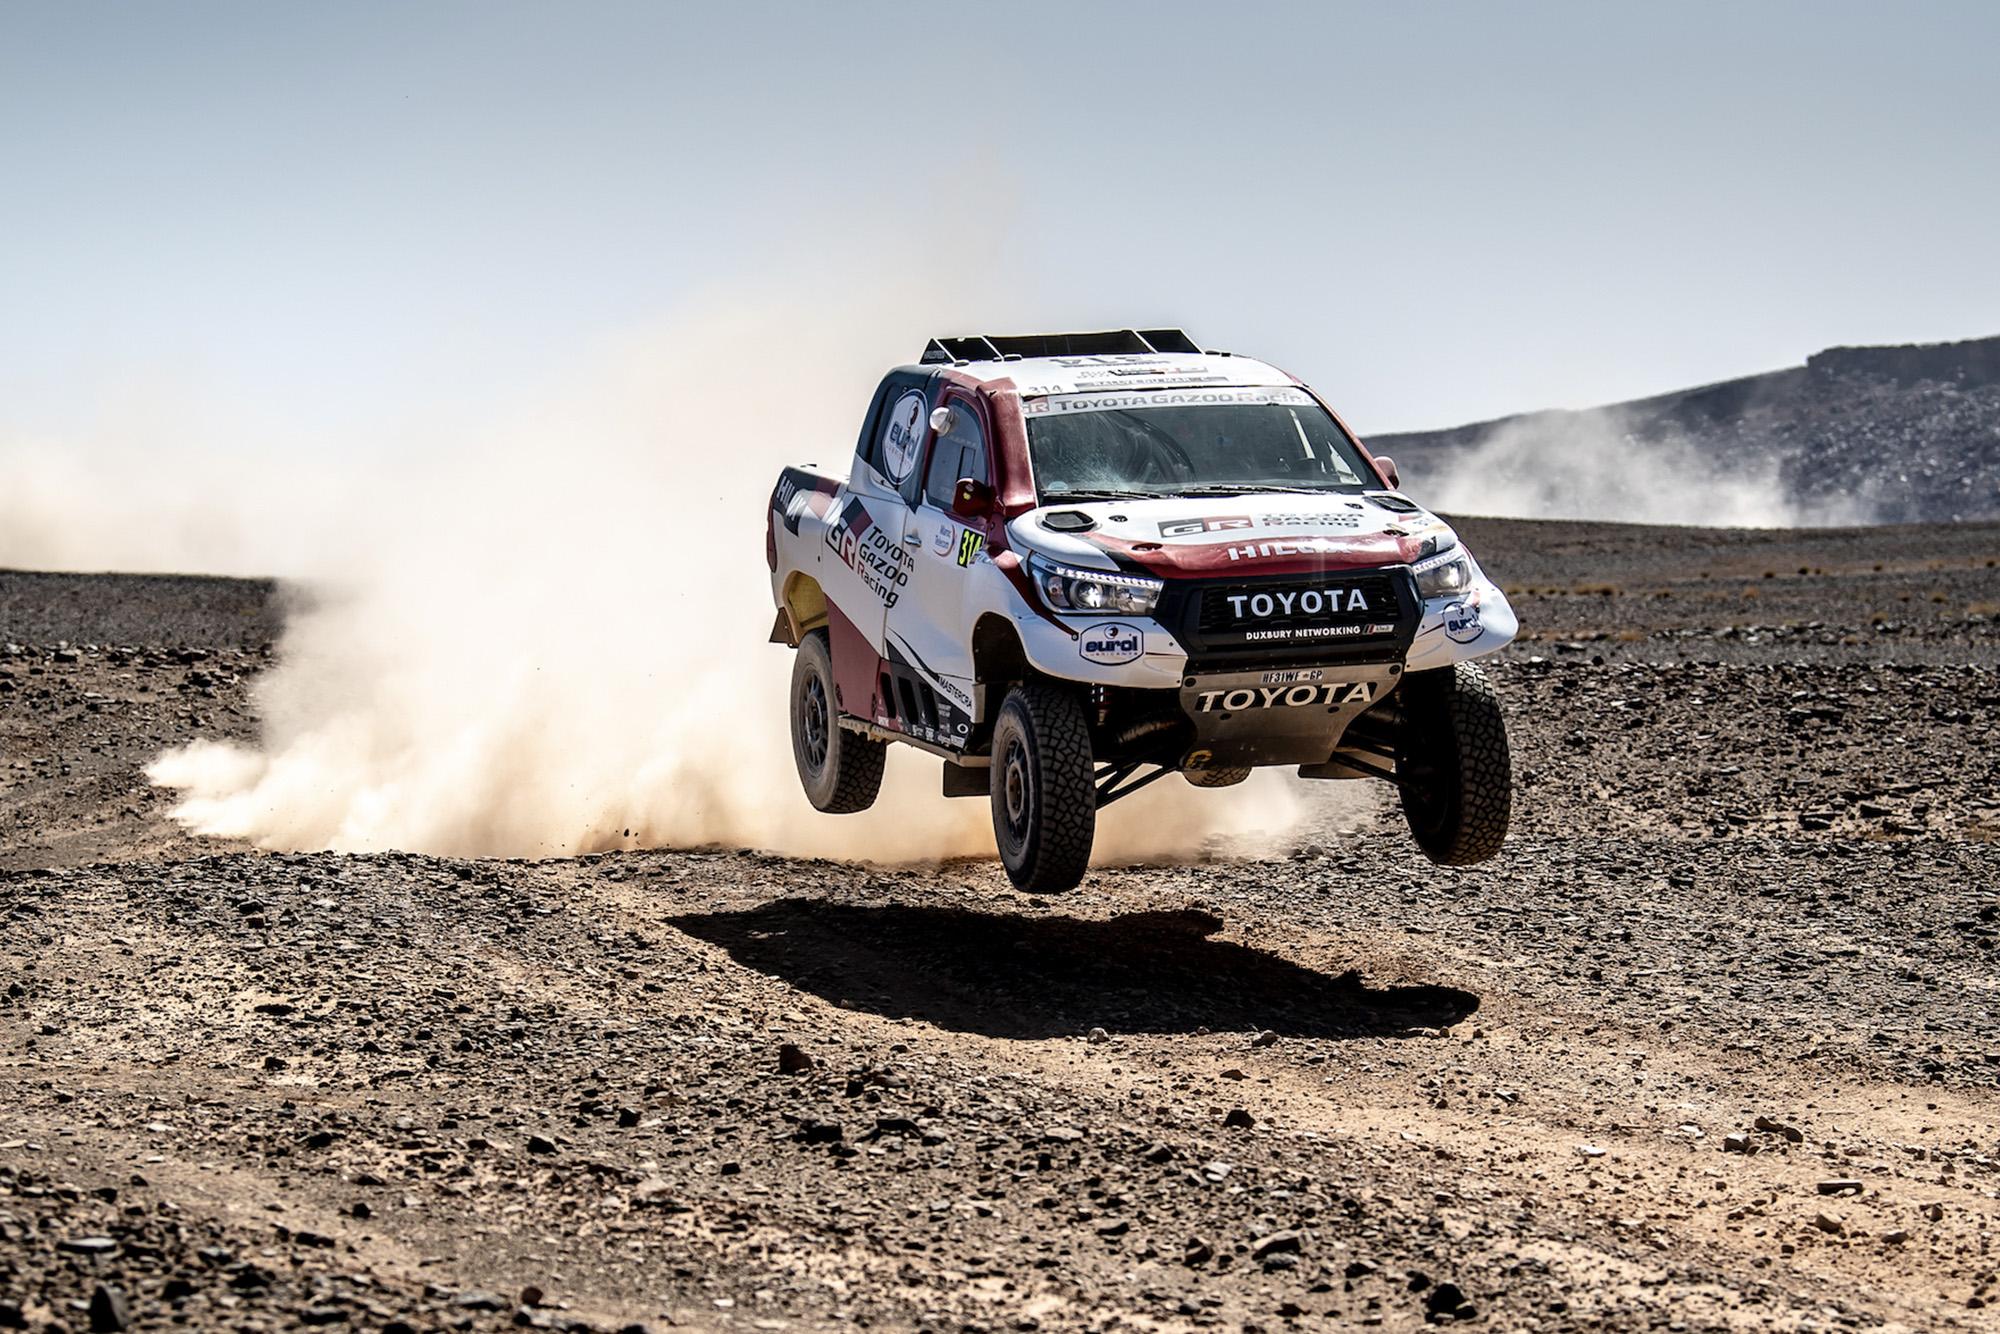 Fernando Alonso's Dakar-spec Toyota Hilix jumping over a rally raid course